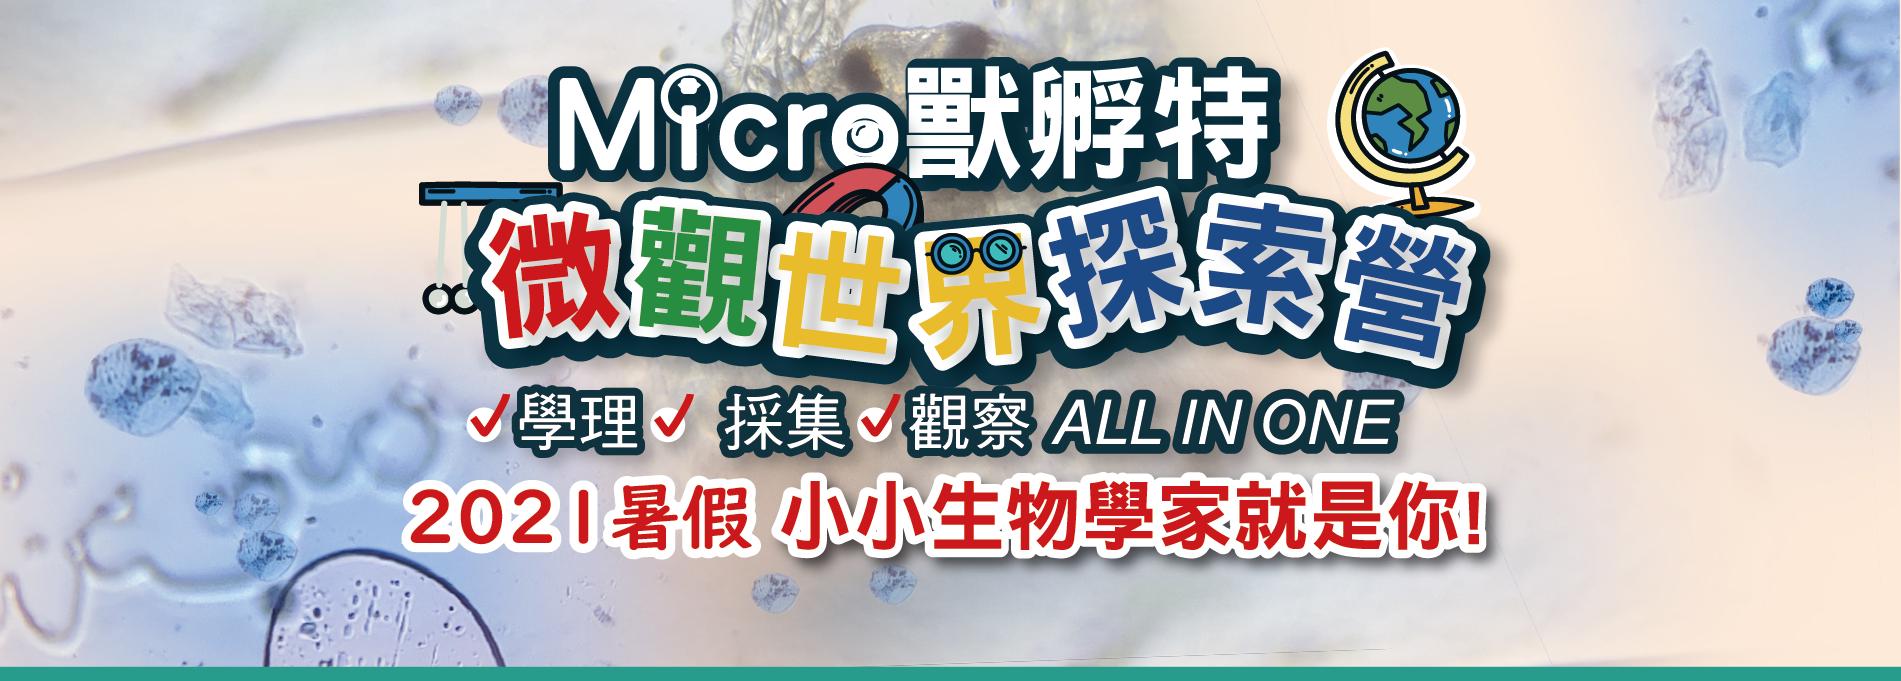 Micro獸孵特-微觀生物營